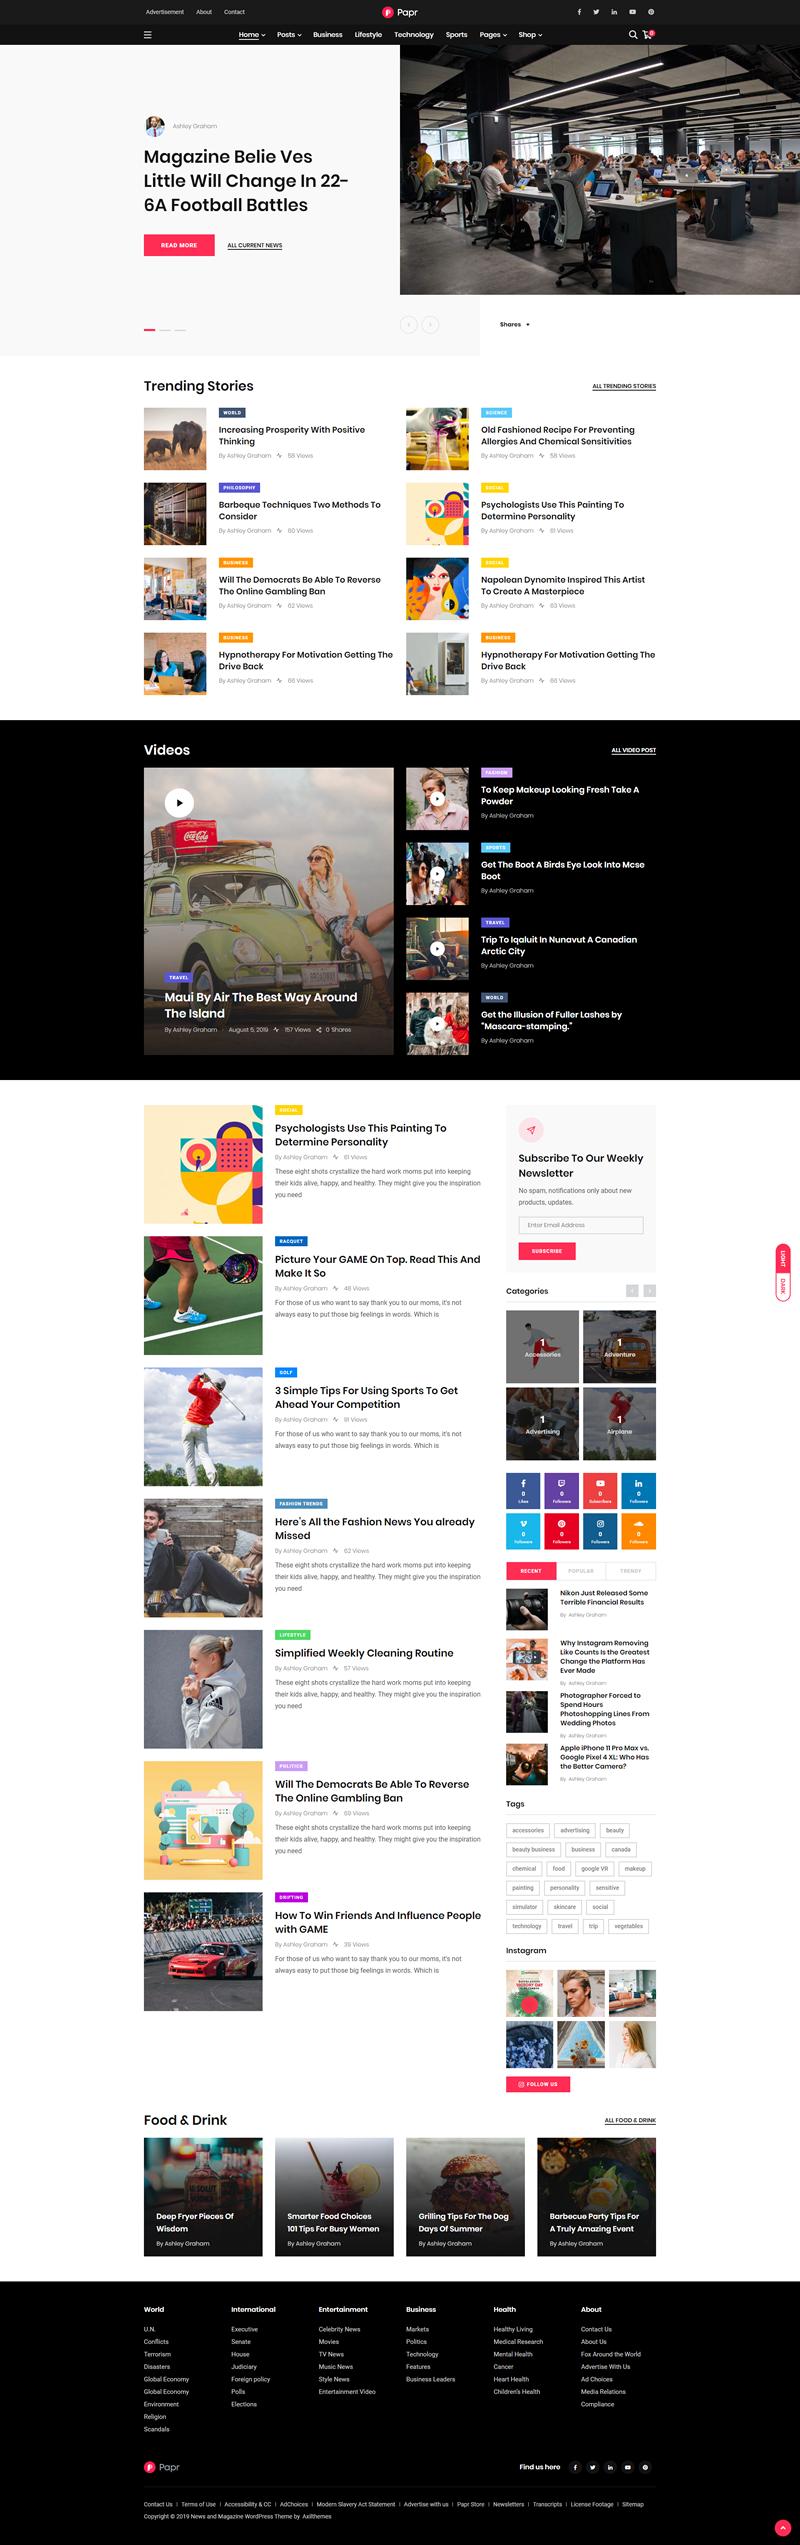 Papr - best WordPress themes